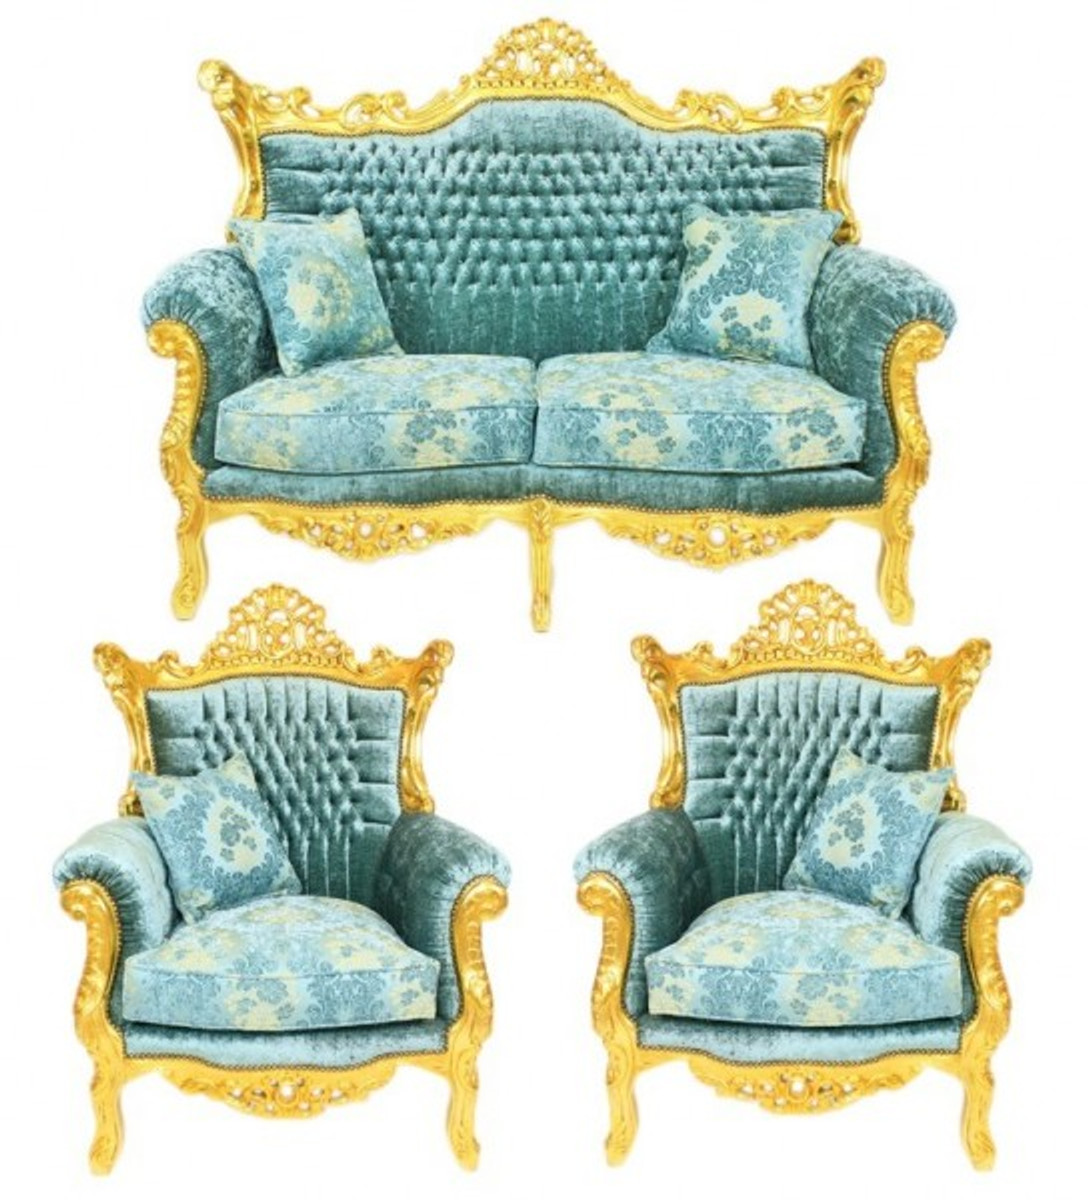 Casa Padrino Barock Wohnzimmer Set Master Türkis-Blau Muster ...